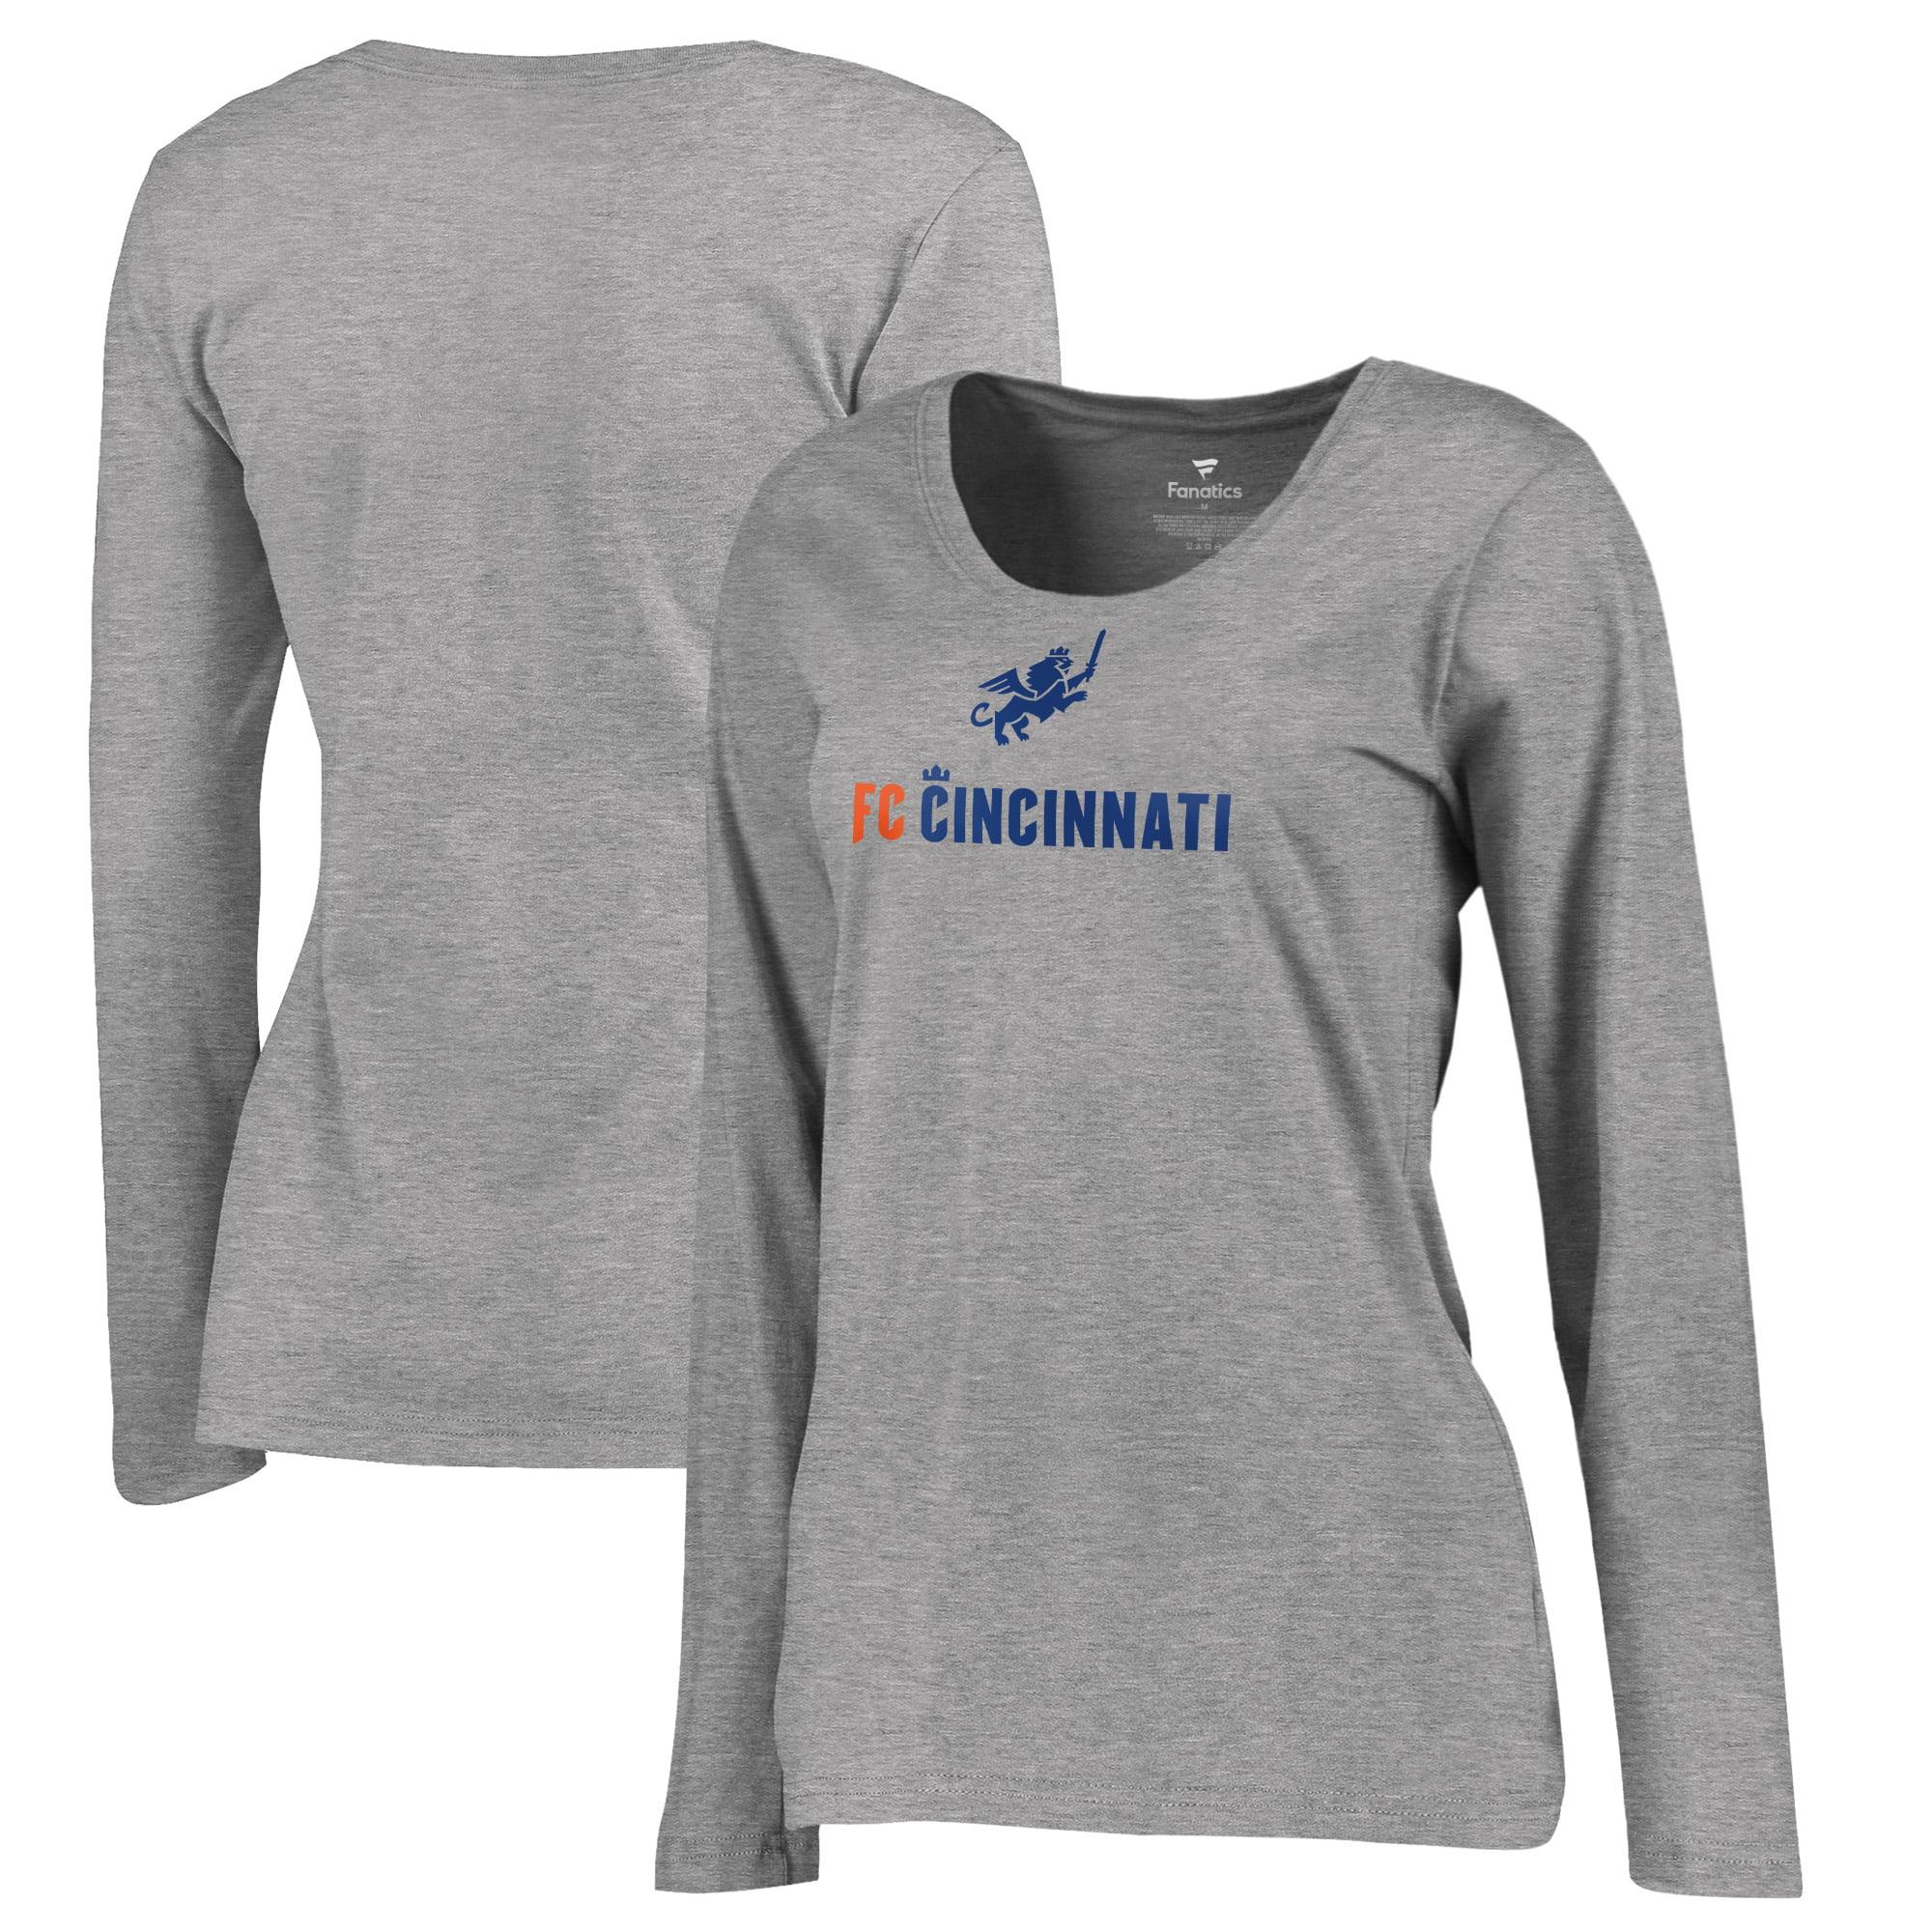 FC Cincinnati Fanatics Branded Women's Victory Arch Plus Size Long Sleeve T-Shirt - Heather Gray